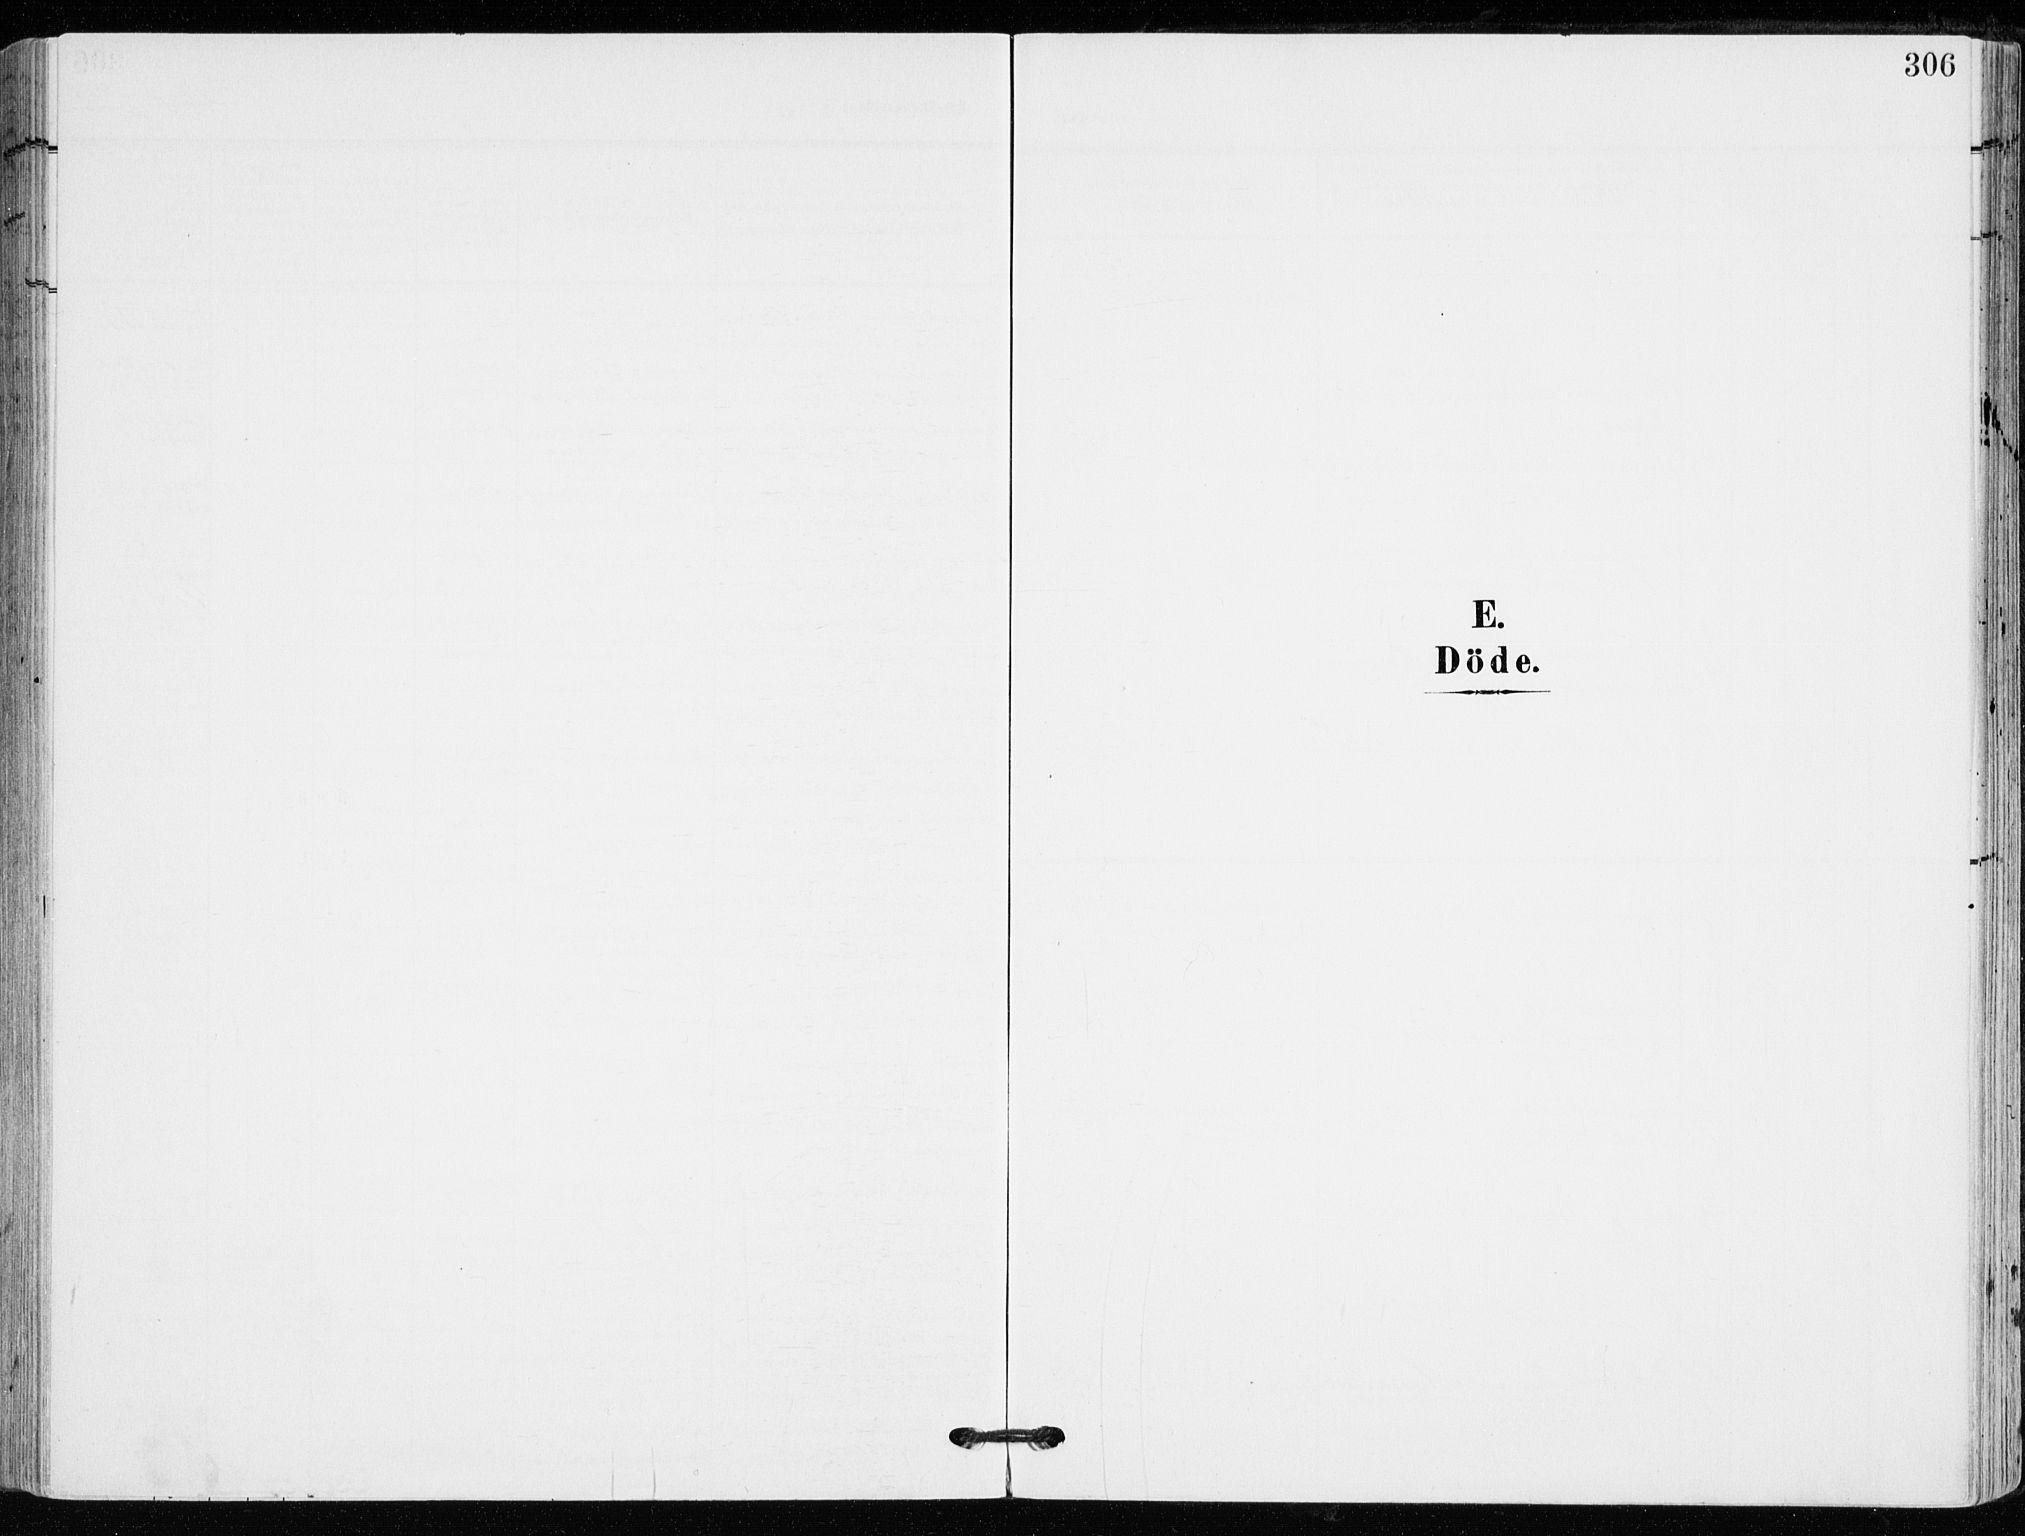 SAKO, Kongsberg kirkebøker, F/Fb/L0004: Ministerialbok nr. II 4, 1906-1918, s. 306